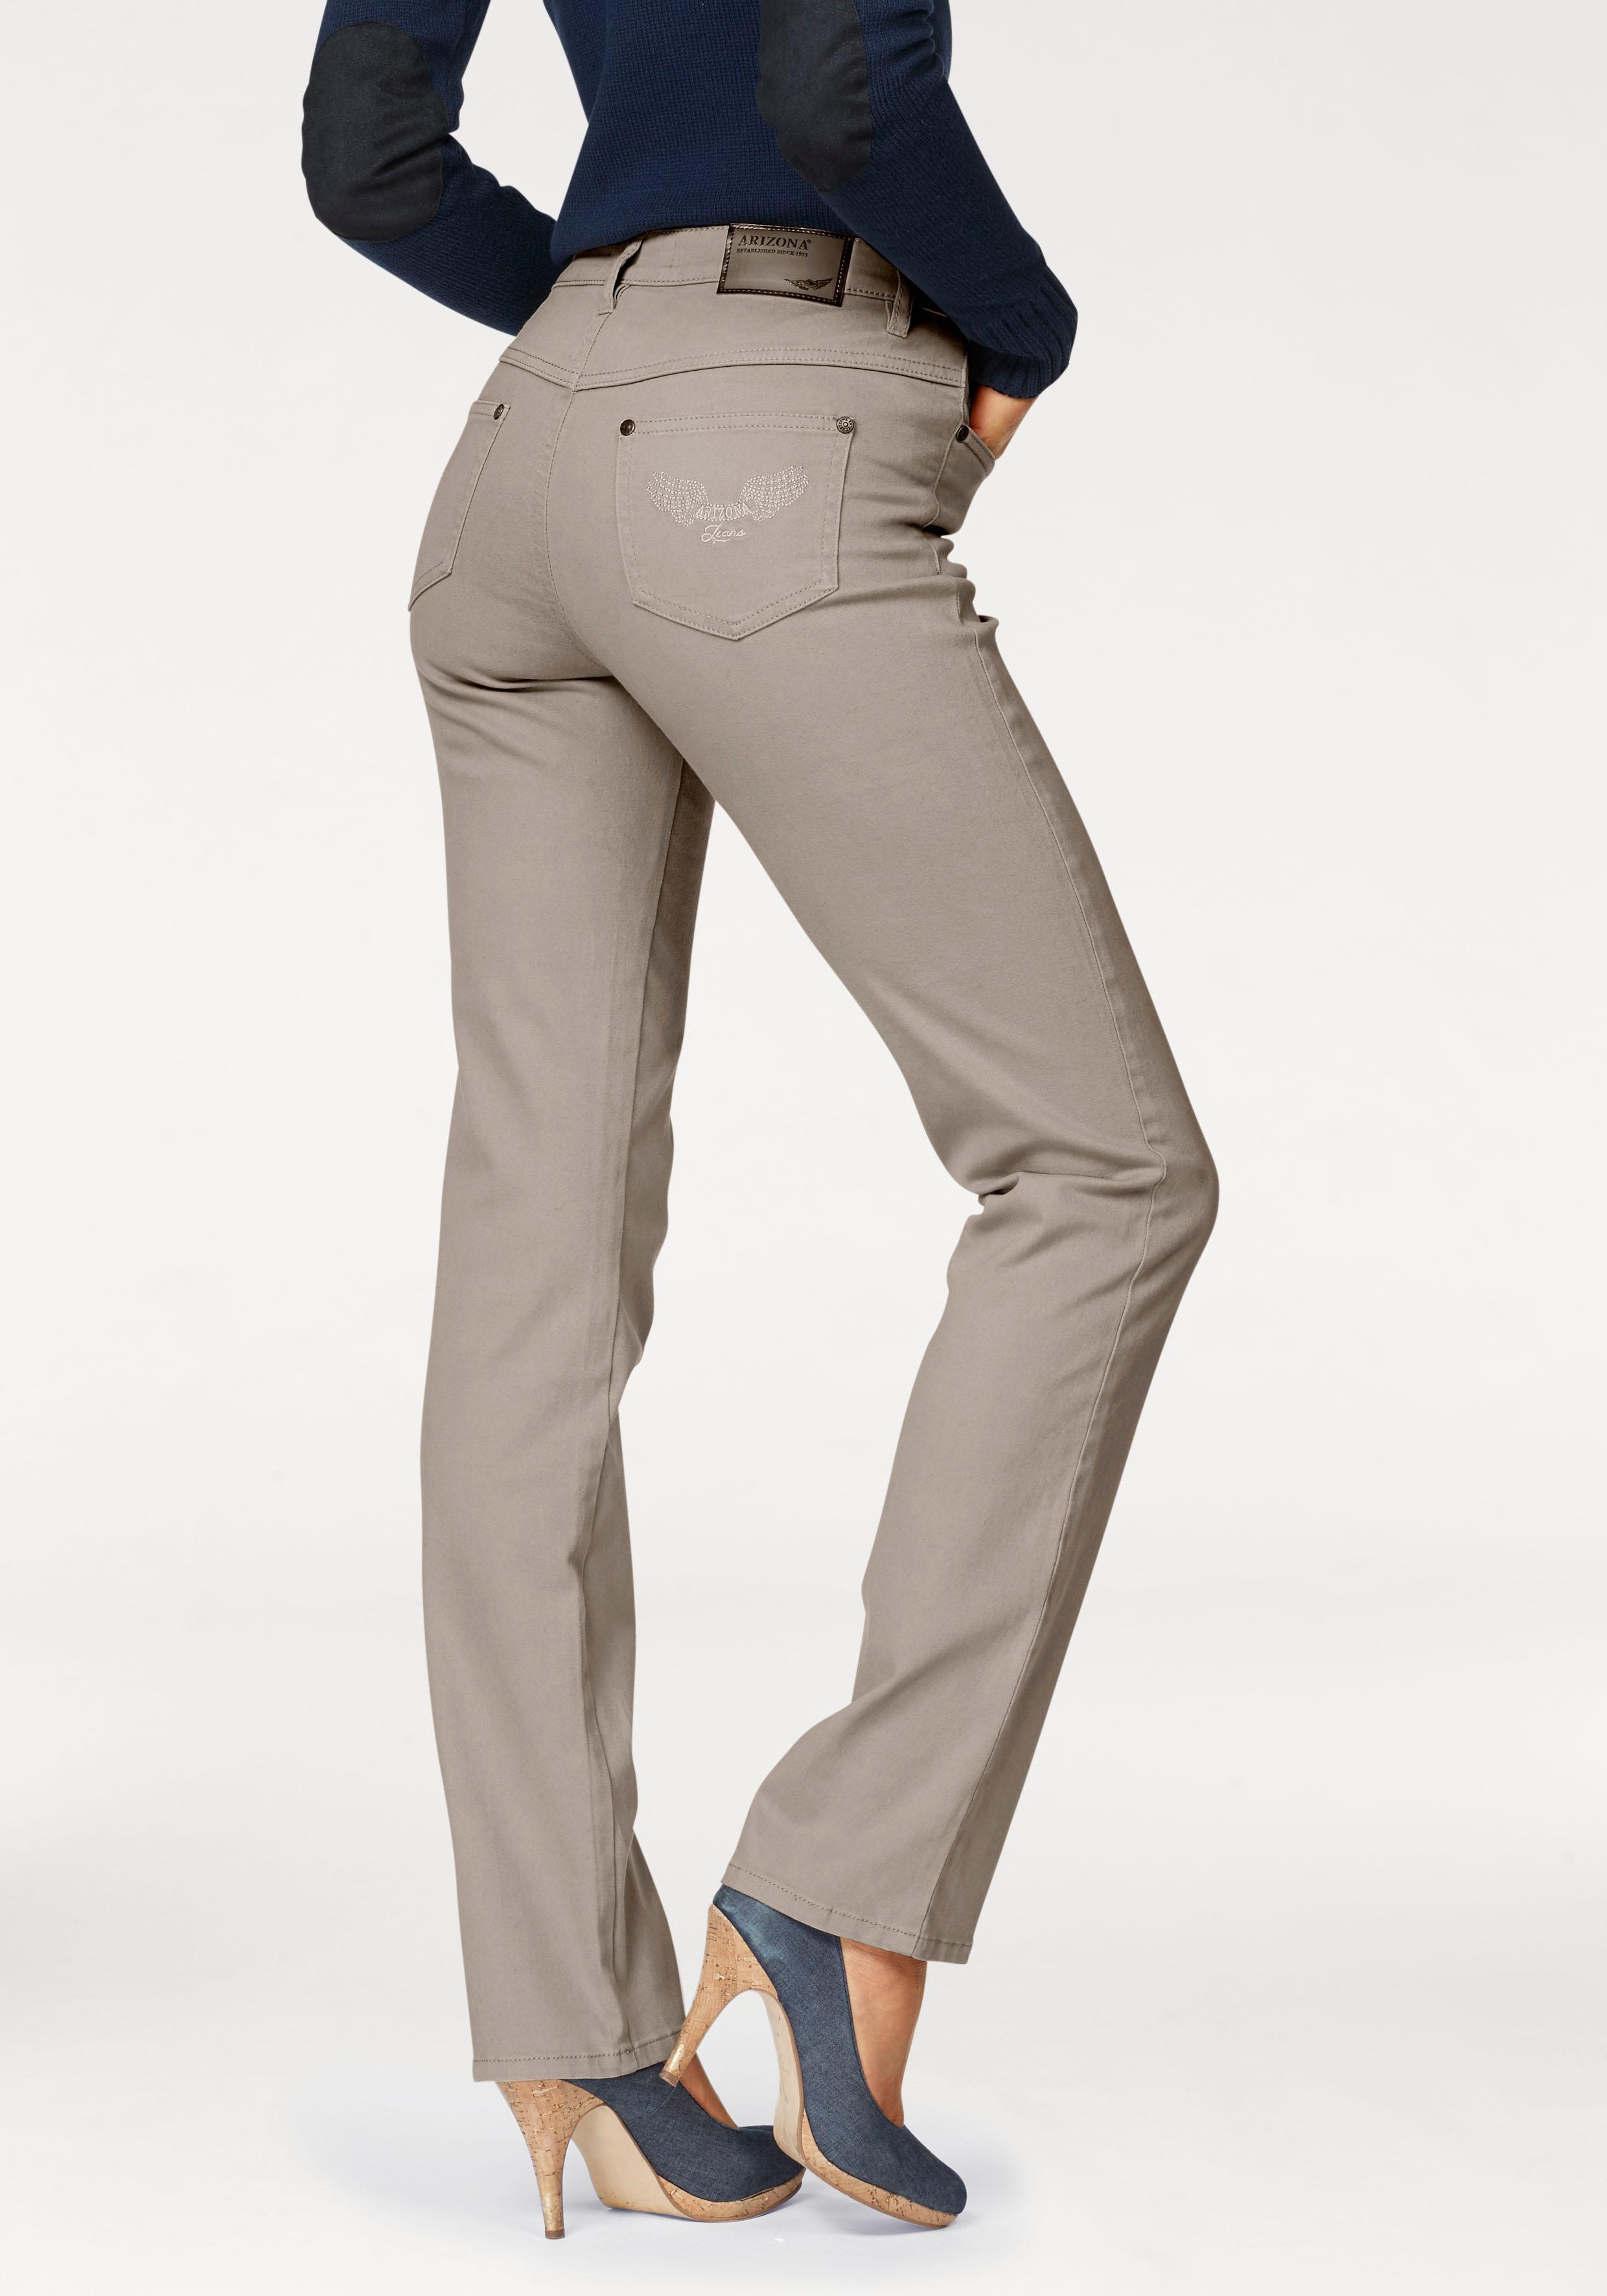 7a4fcf46b542 Arizona Gerade Jeans »Comfort-Fit« für   BAUR